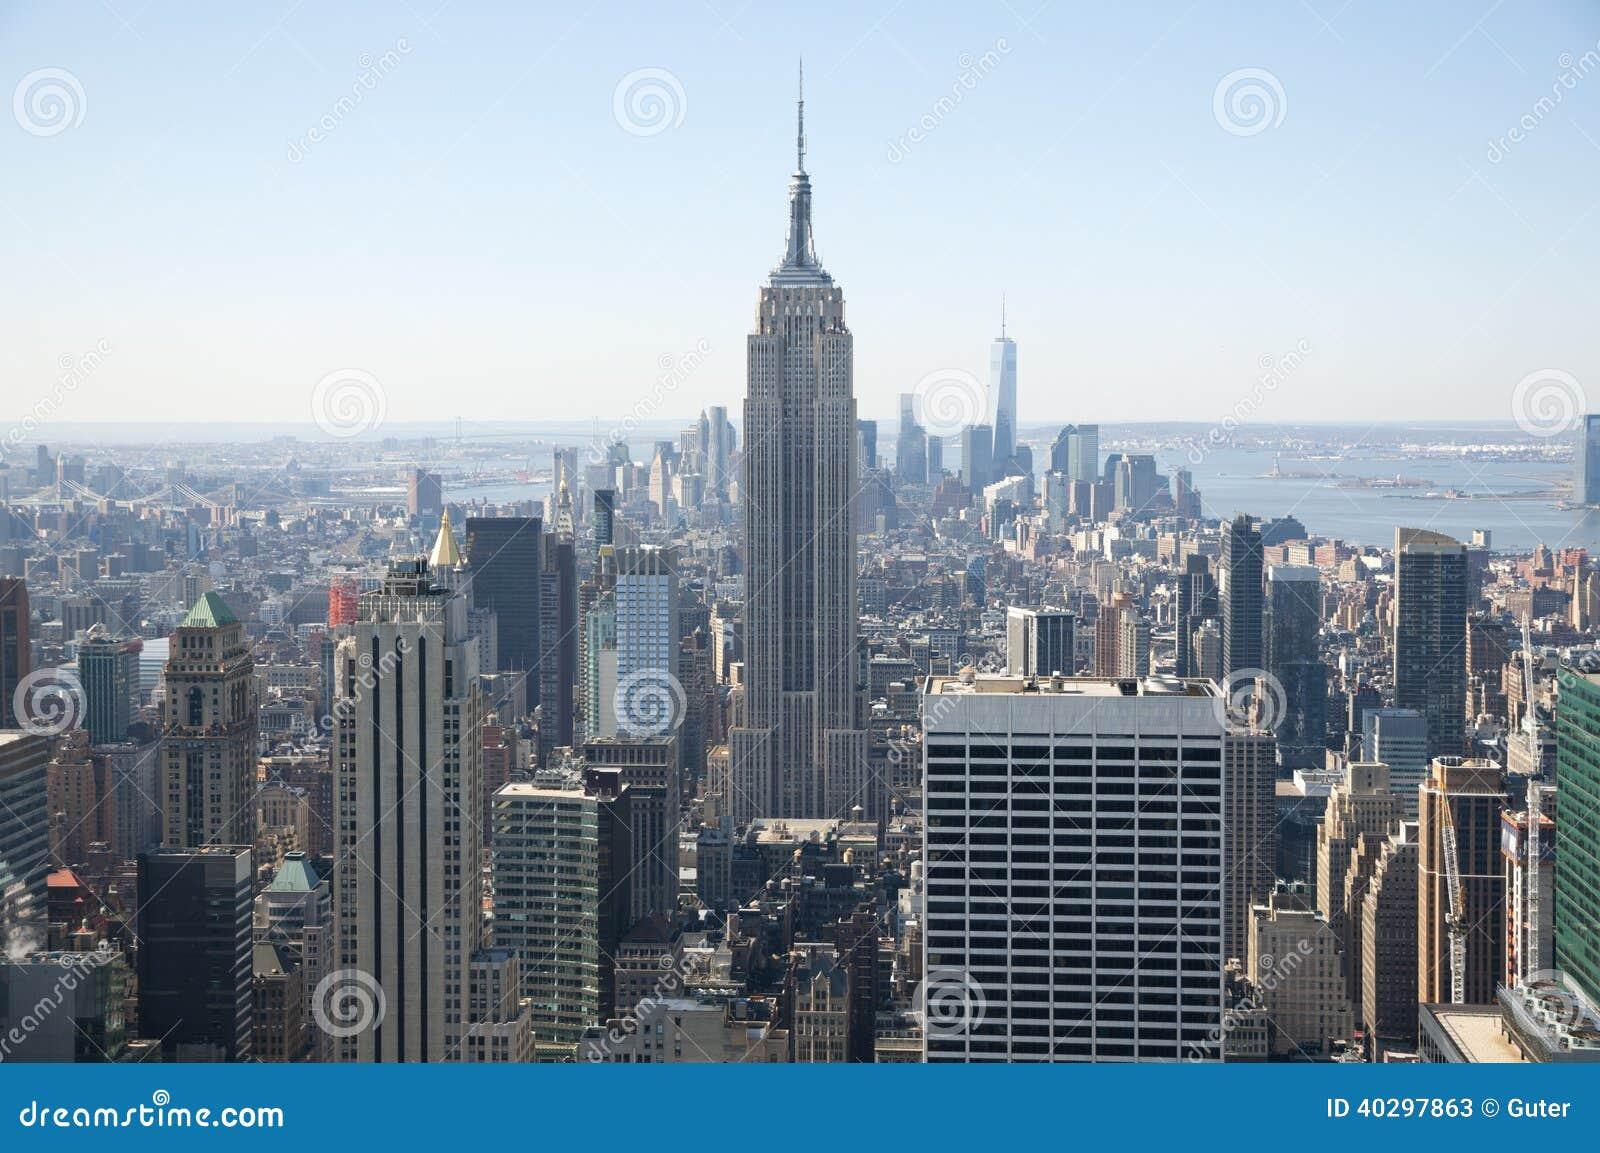 manhattan-new-york-city-empire-state-bui